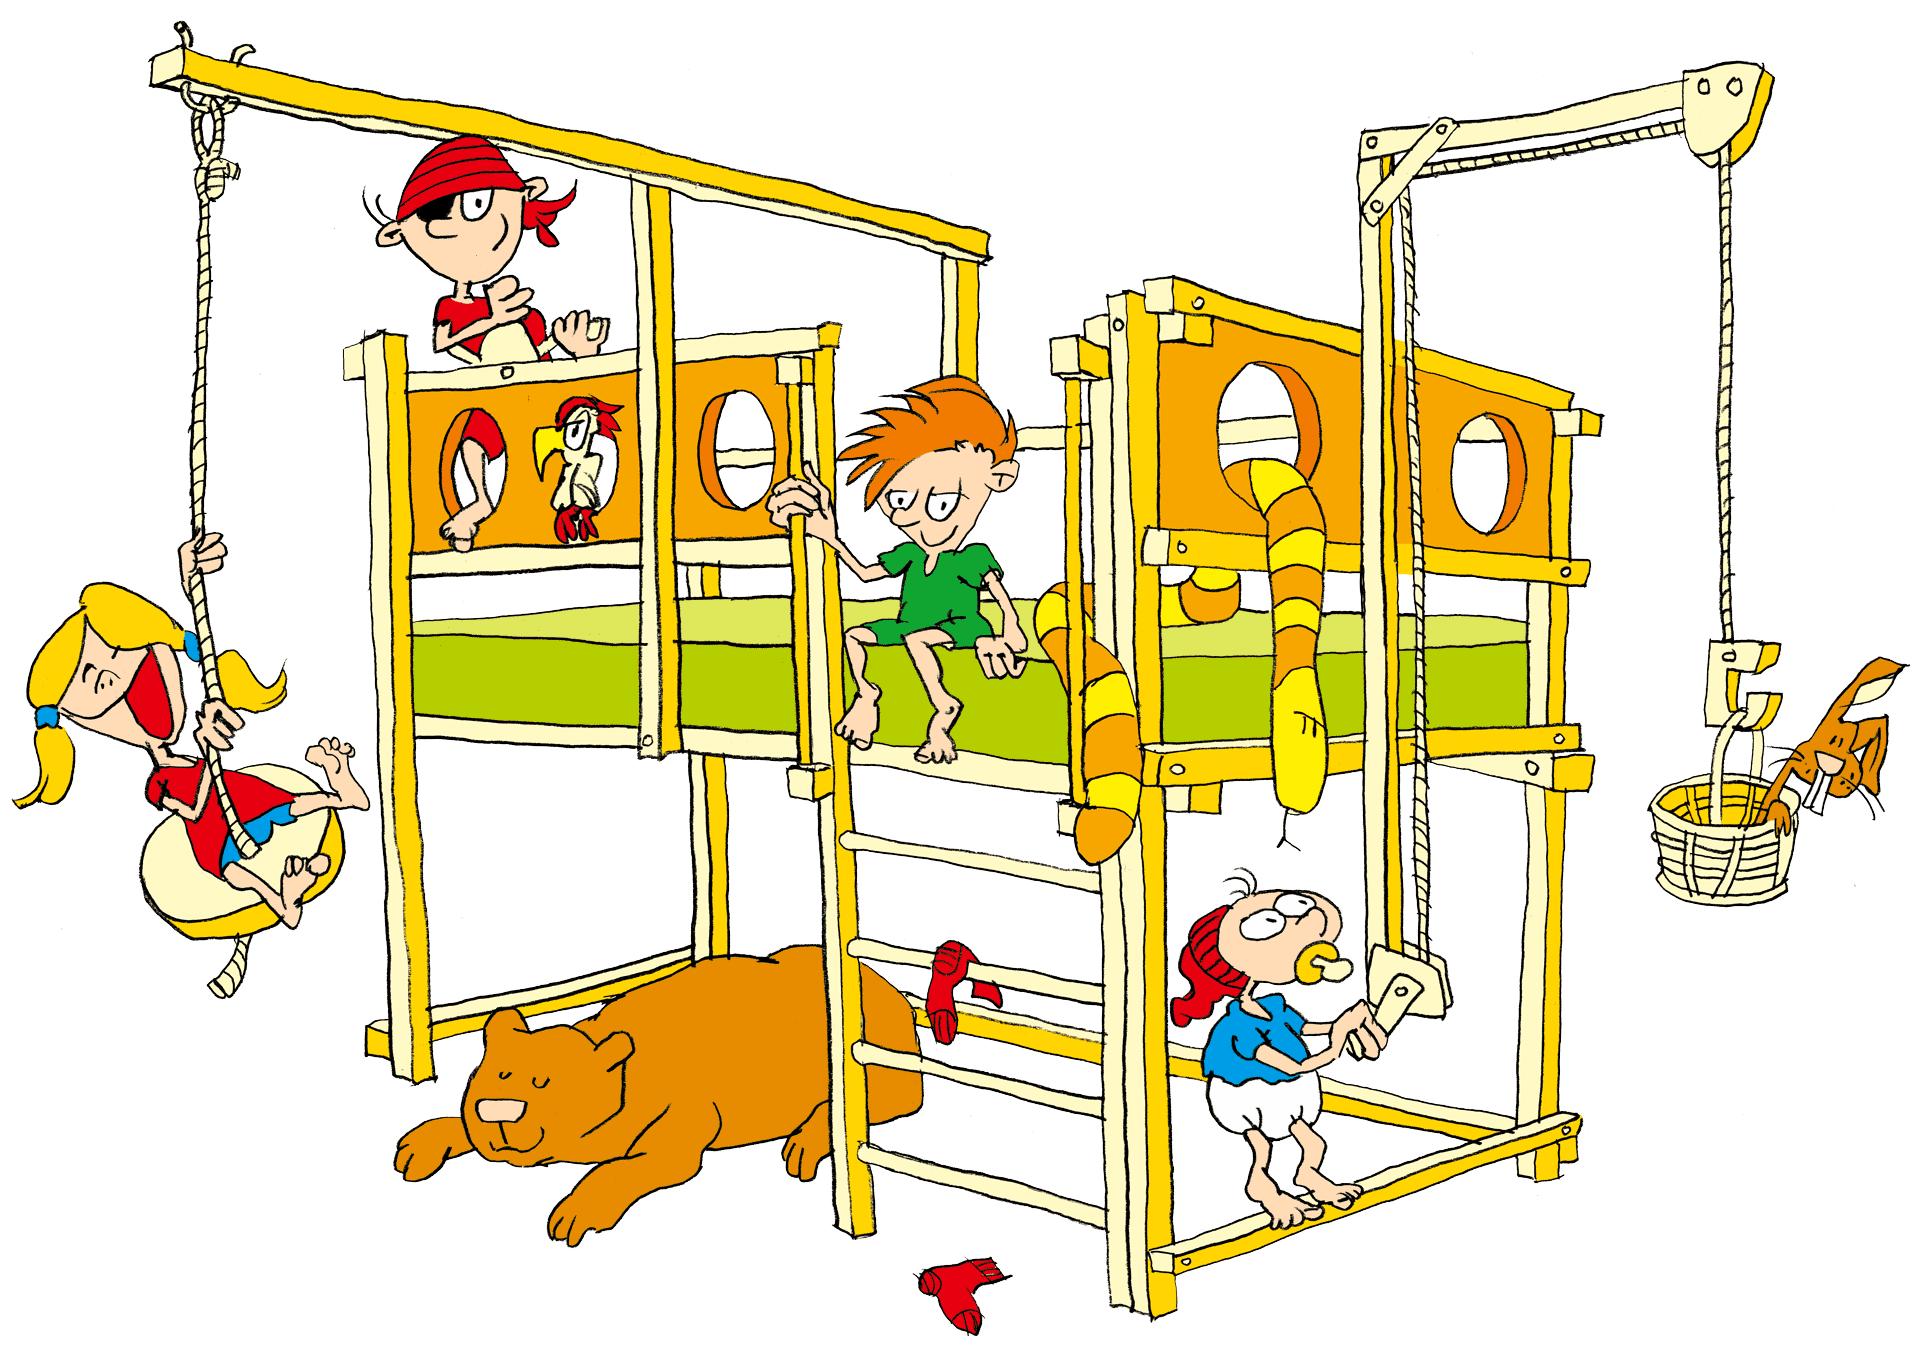 Kinderbetten online kaufen billi bolli kinderm bel for Kinderbetten selber bauen